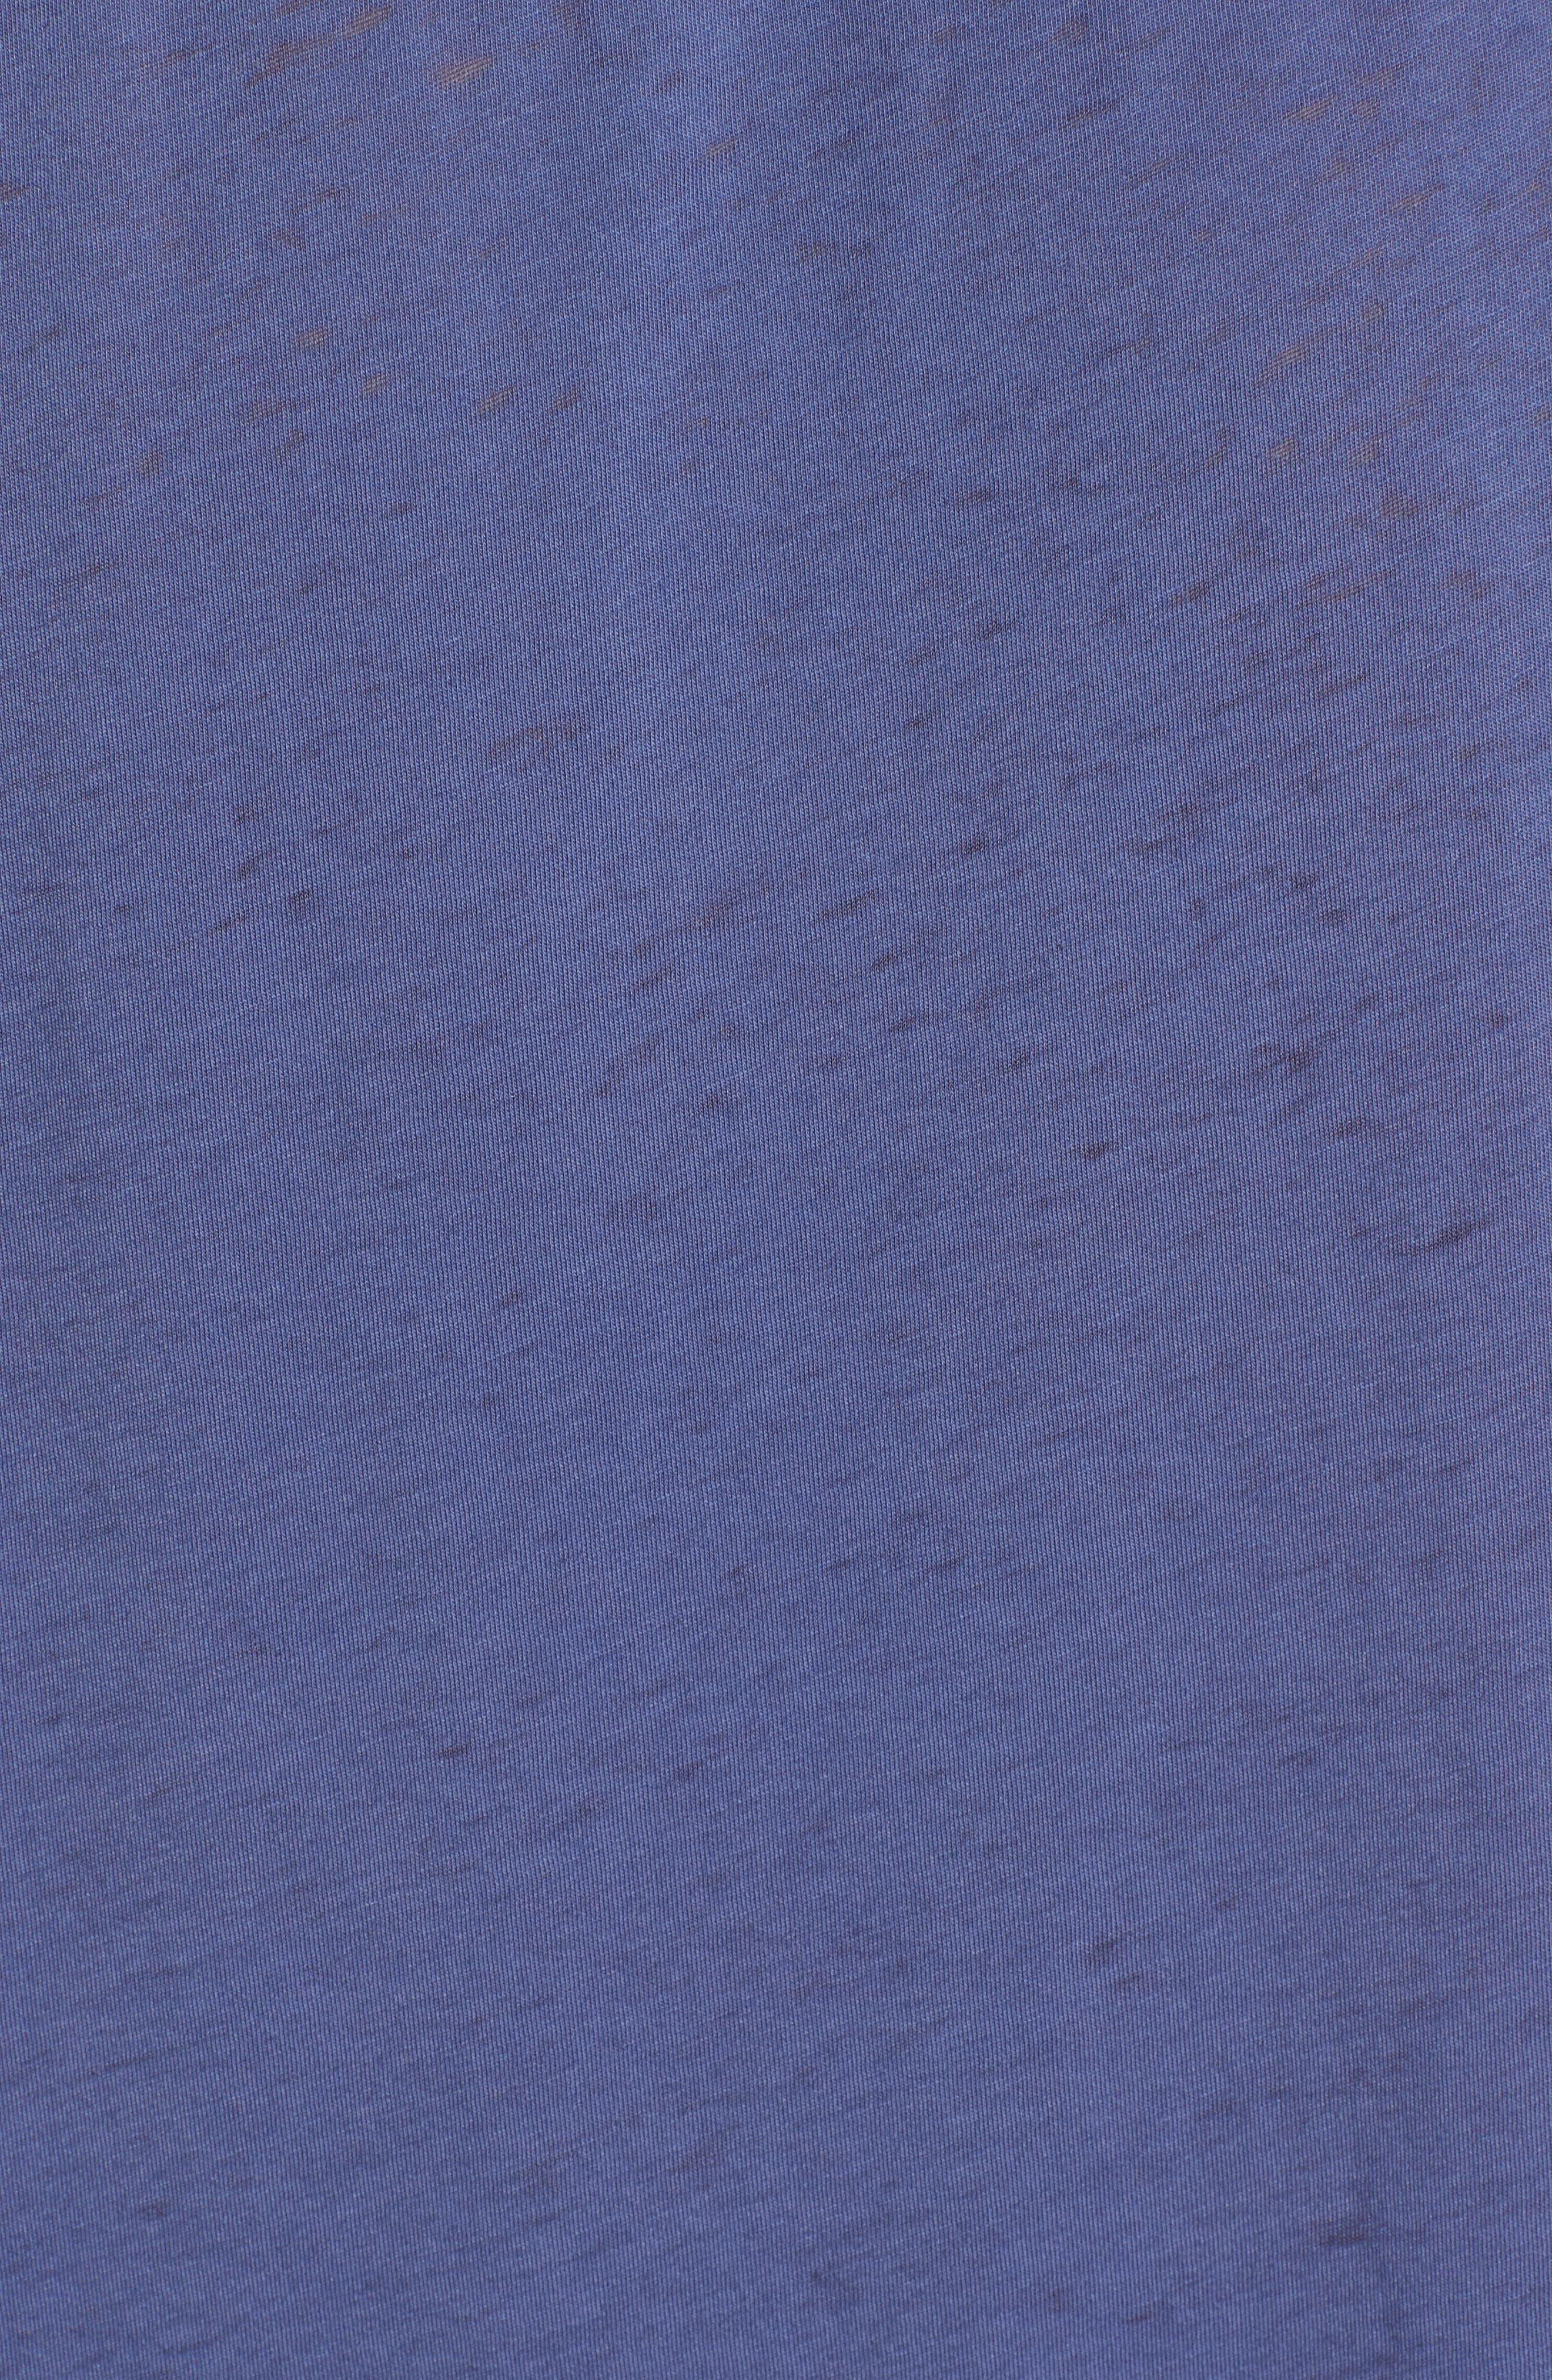 Burnout Boyfriend Tee,                             Alternate thumbnail 6, color,                             BLUE INDIGO